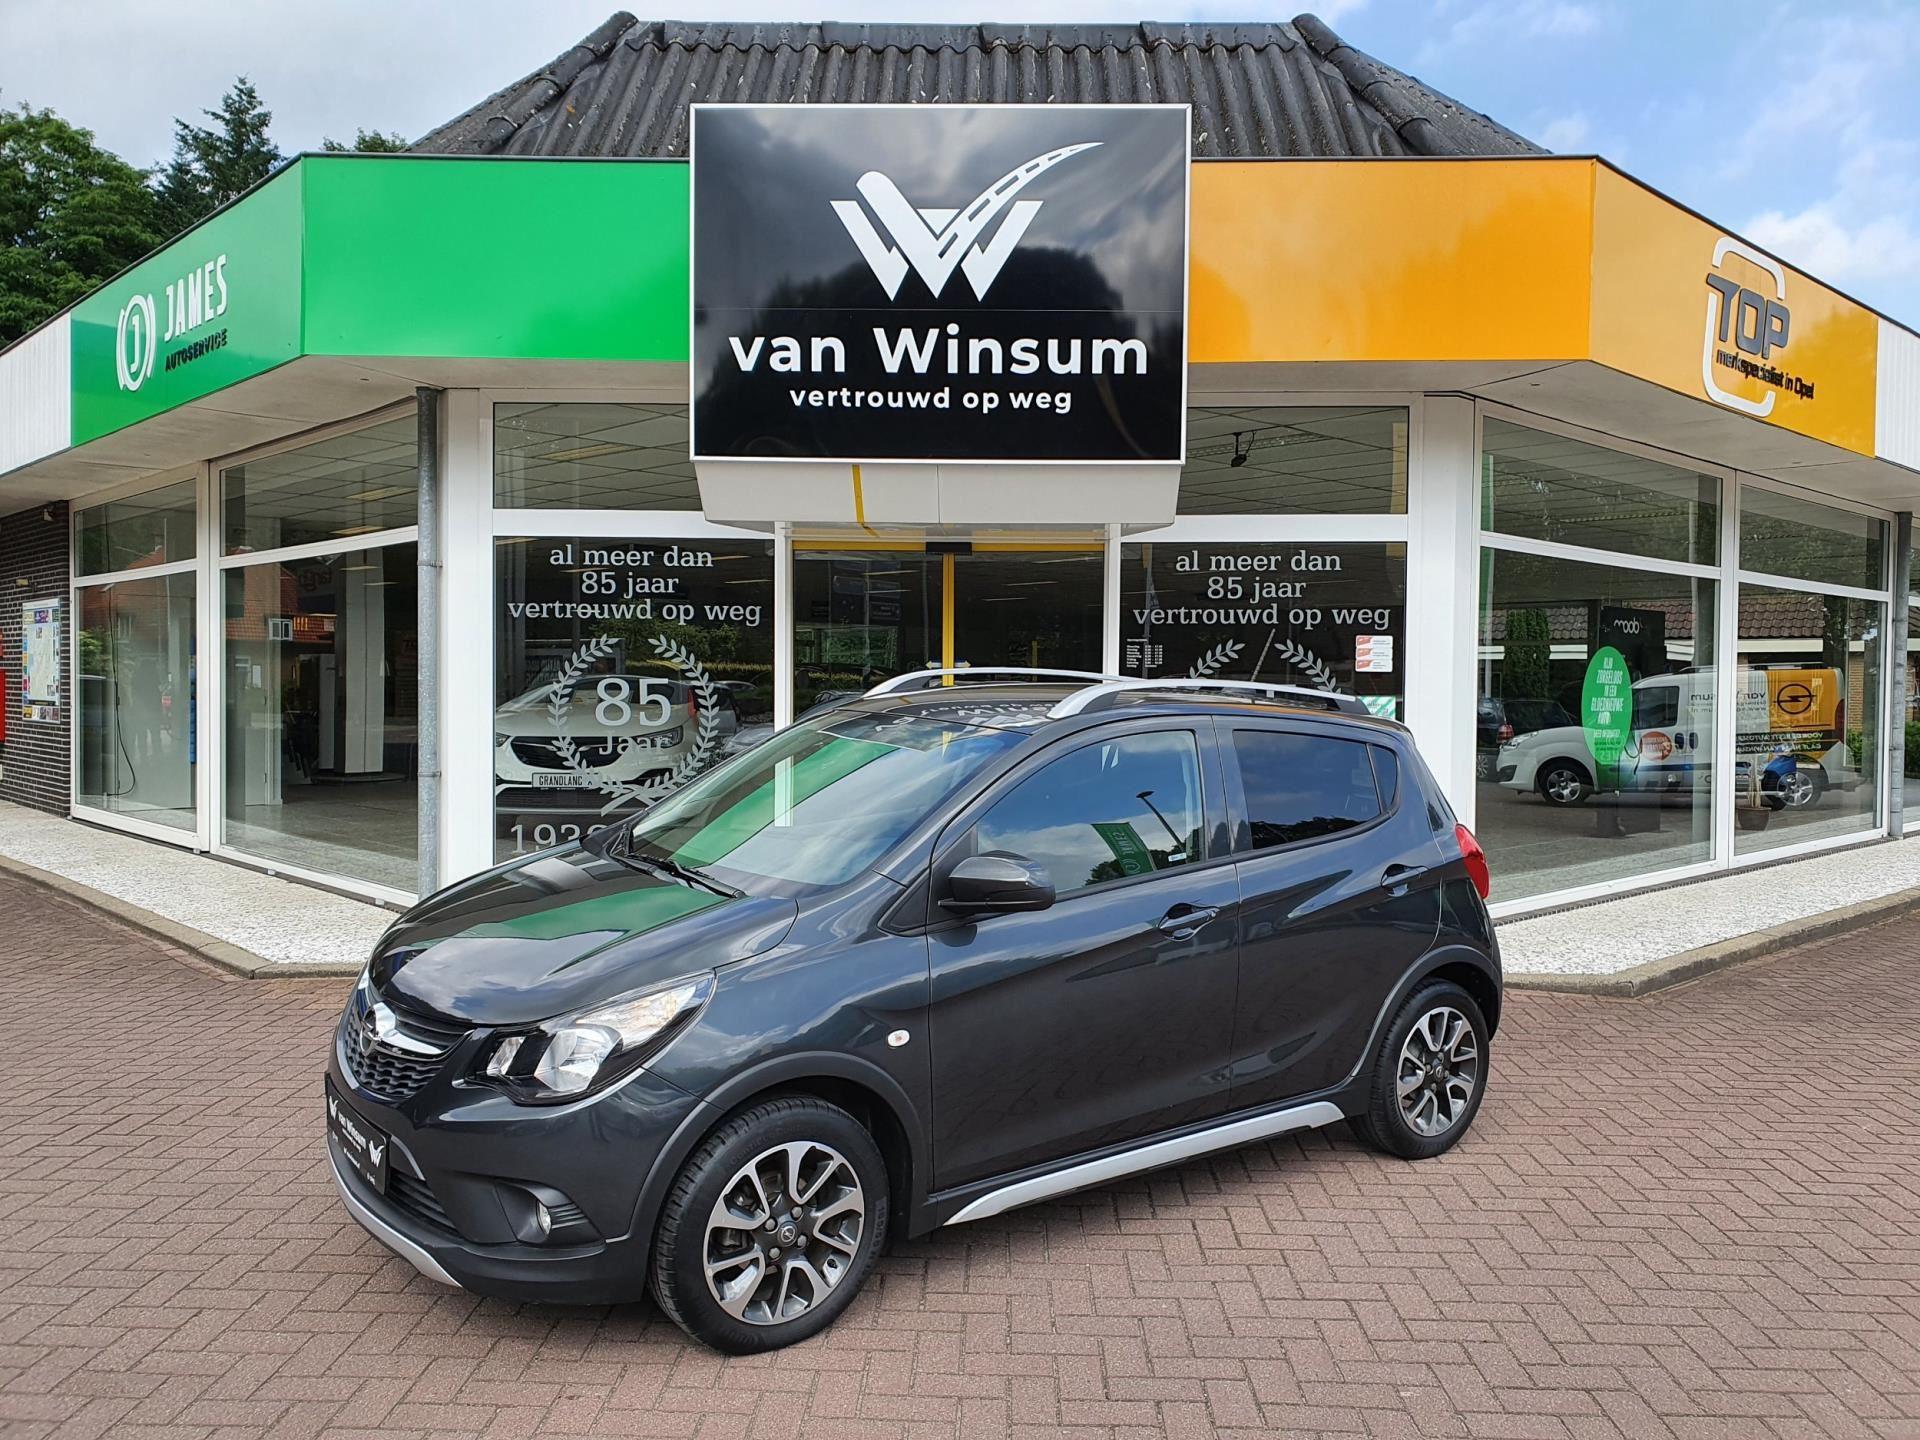 Opel KARL occasion - Autobedrijf G. Van Winsum B.V.